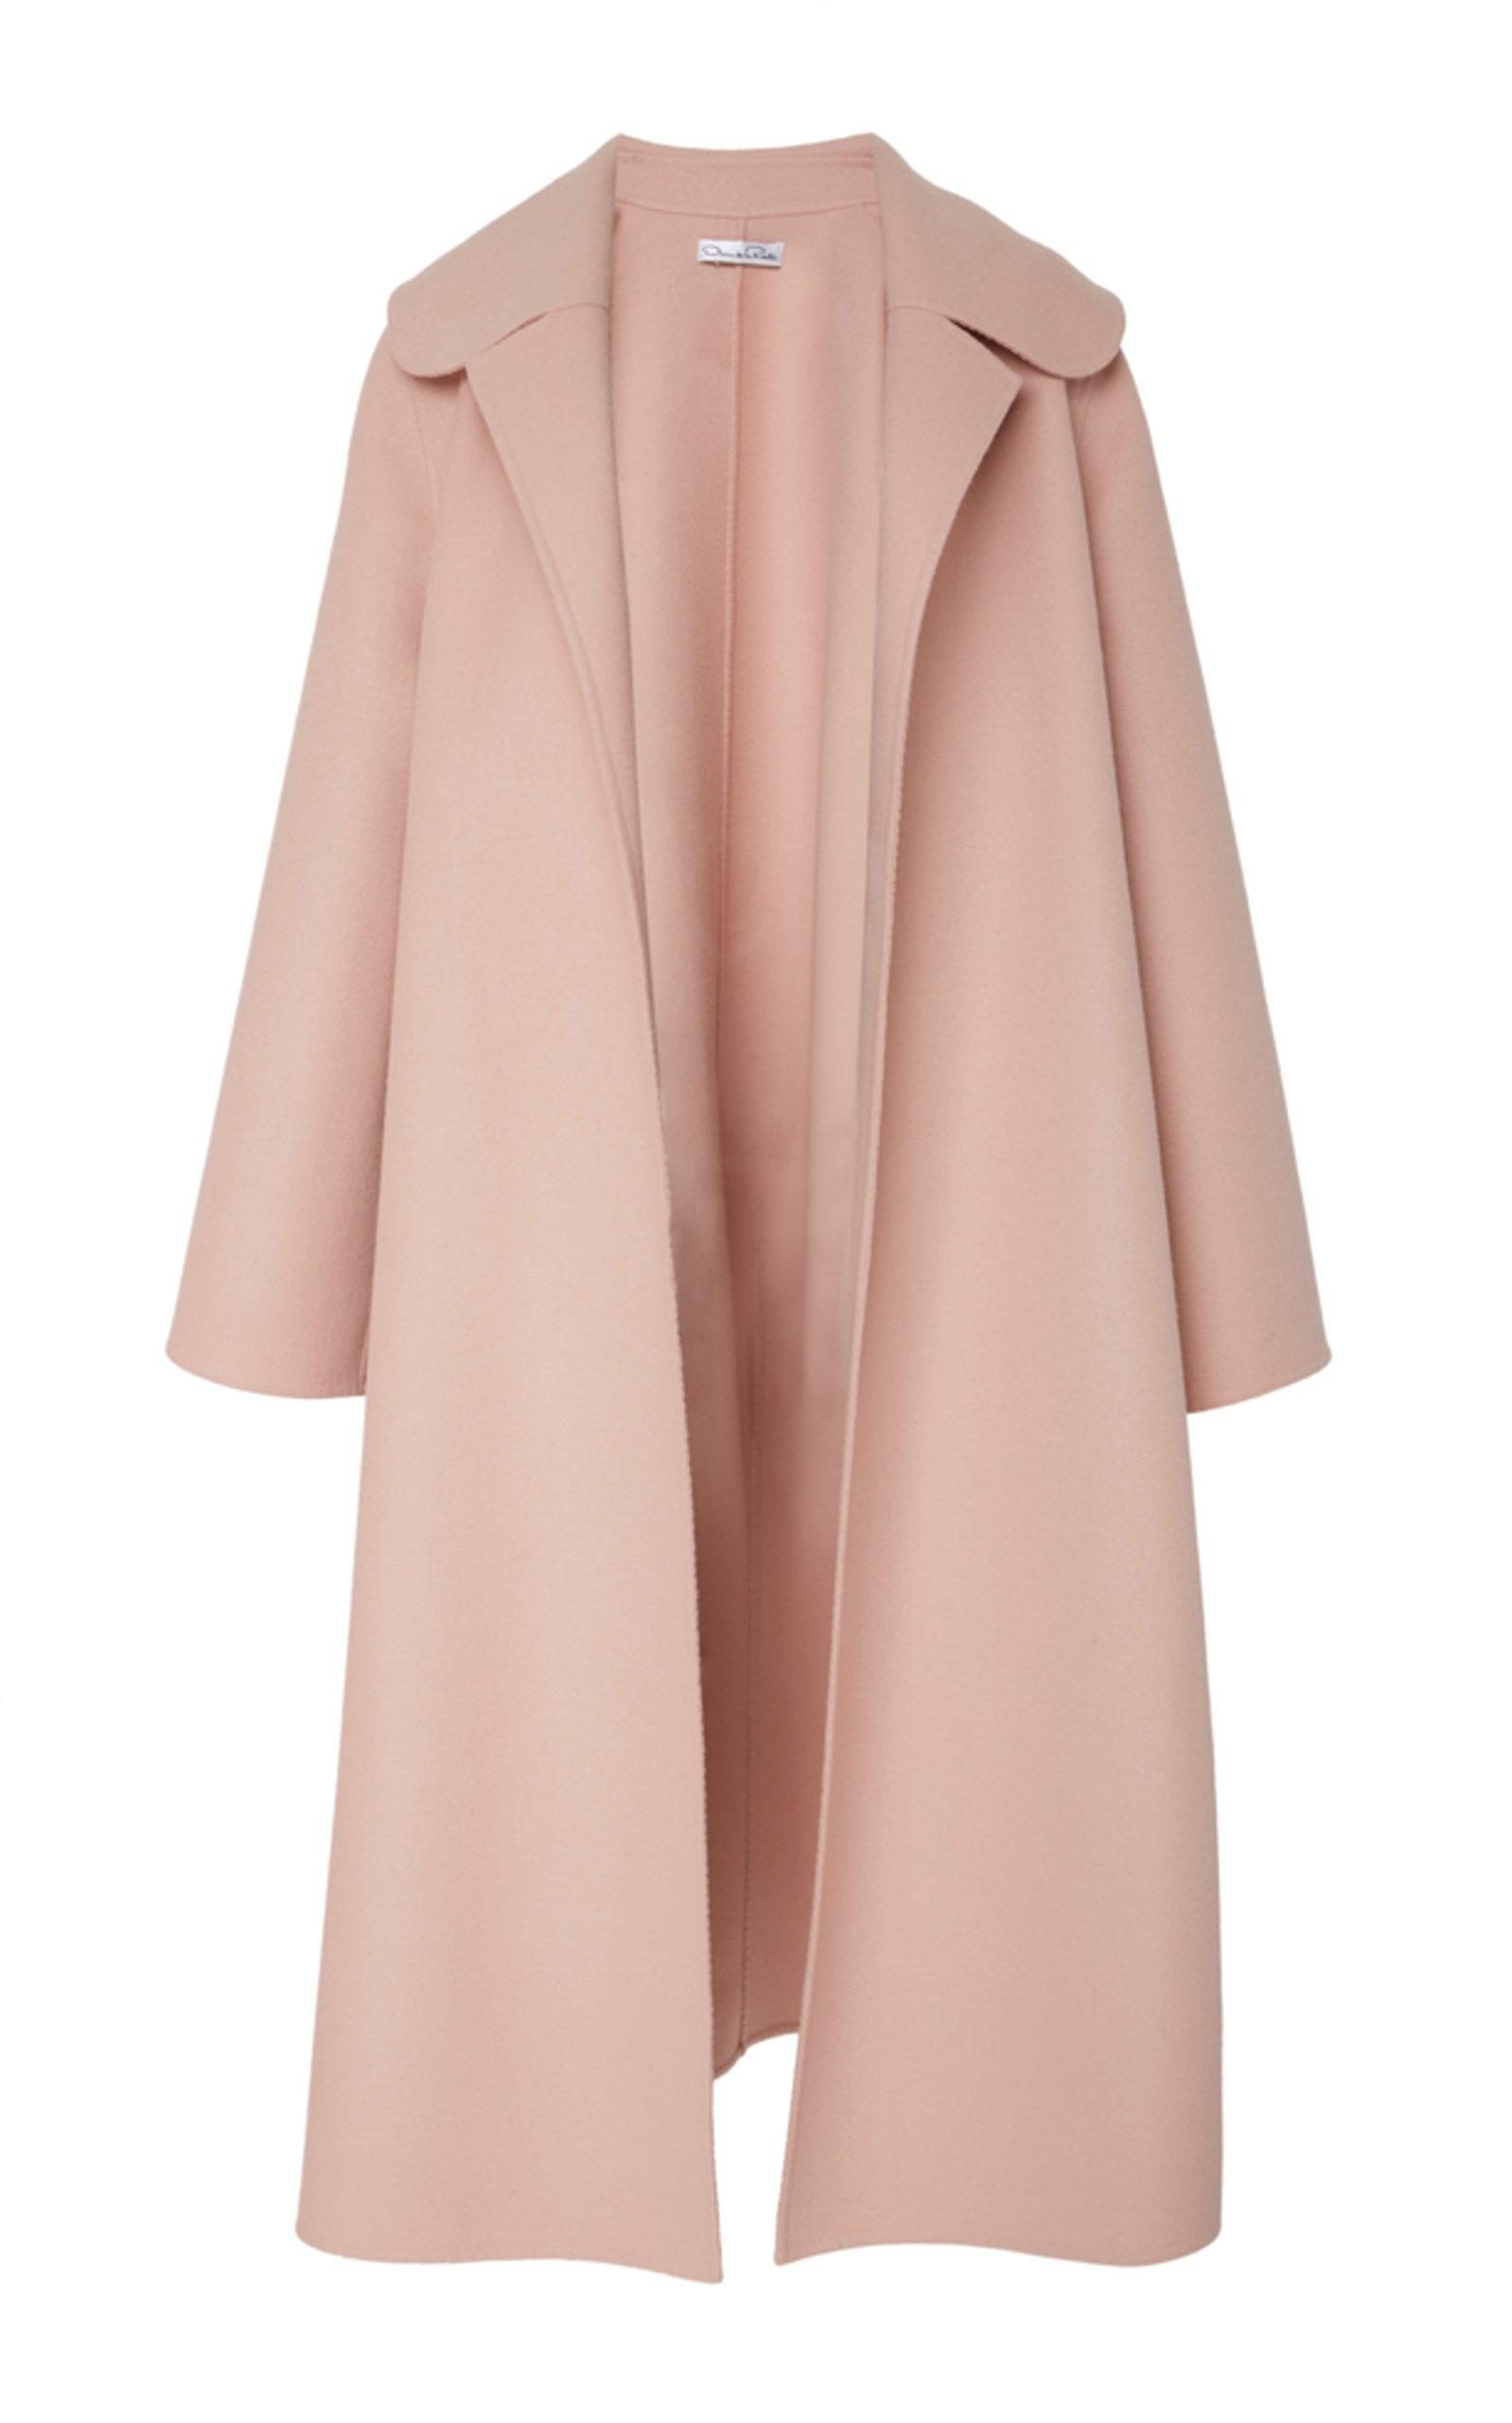 Draped Coat by Oscar de la Renta   Moda Operandi